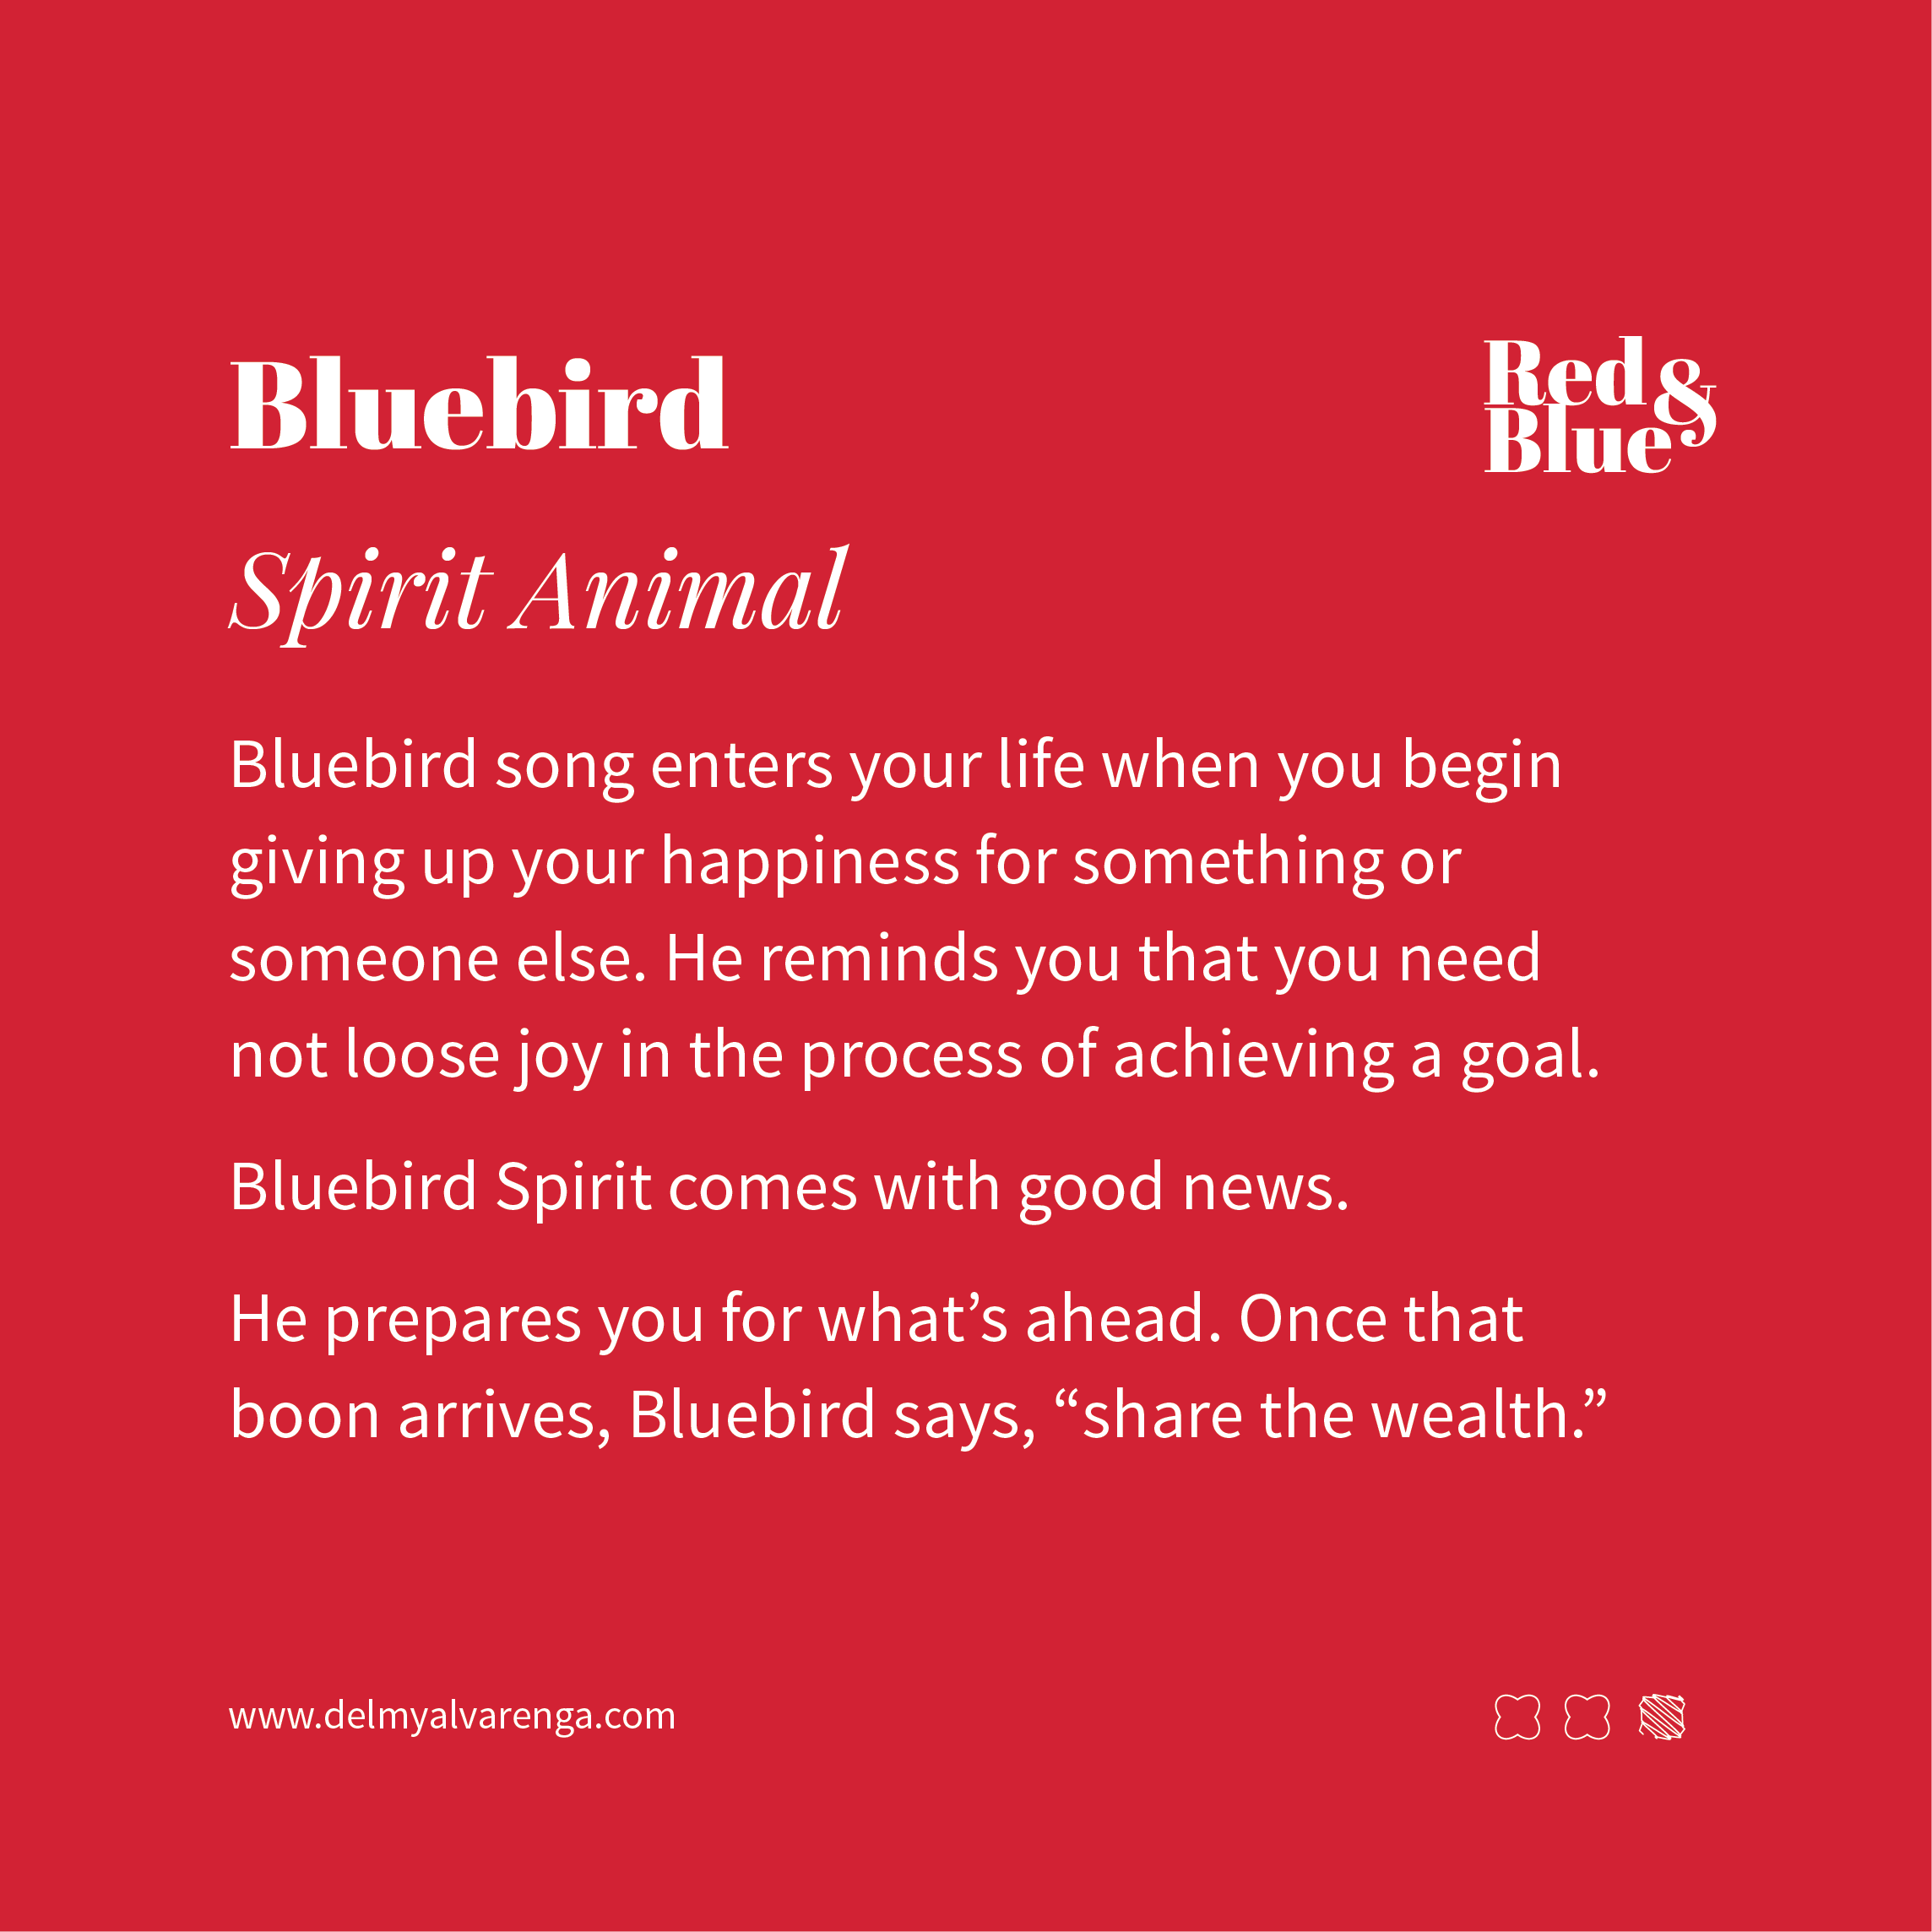 Bluebird Spirit Animal